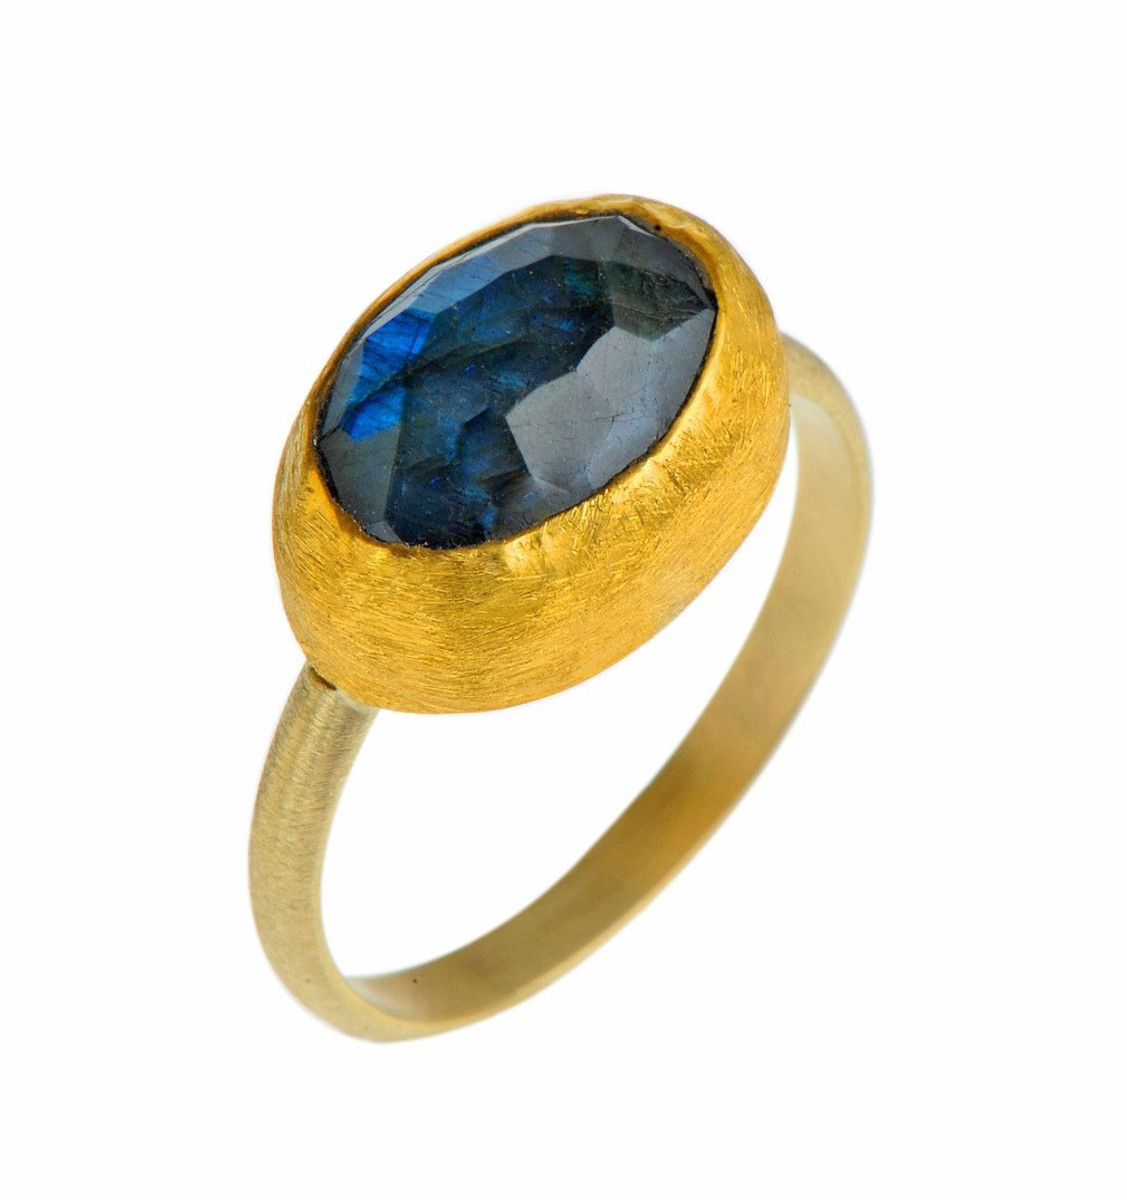 Forever Loving Labradorite Gold Ring by Nava Zahavi - New Arrival